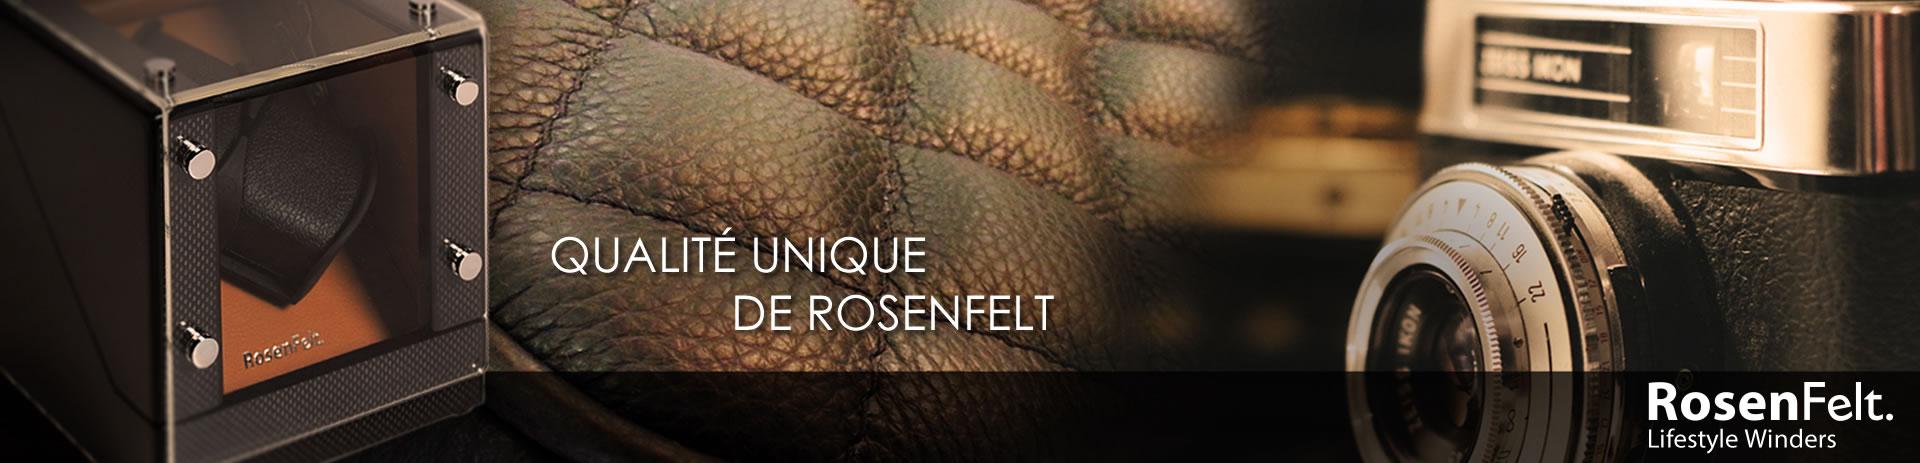 Remontoir montre Rosenfelt